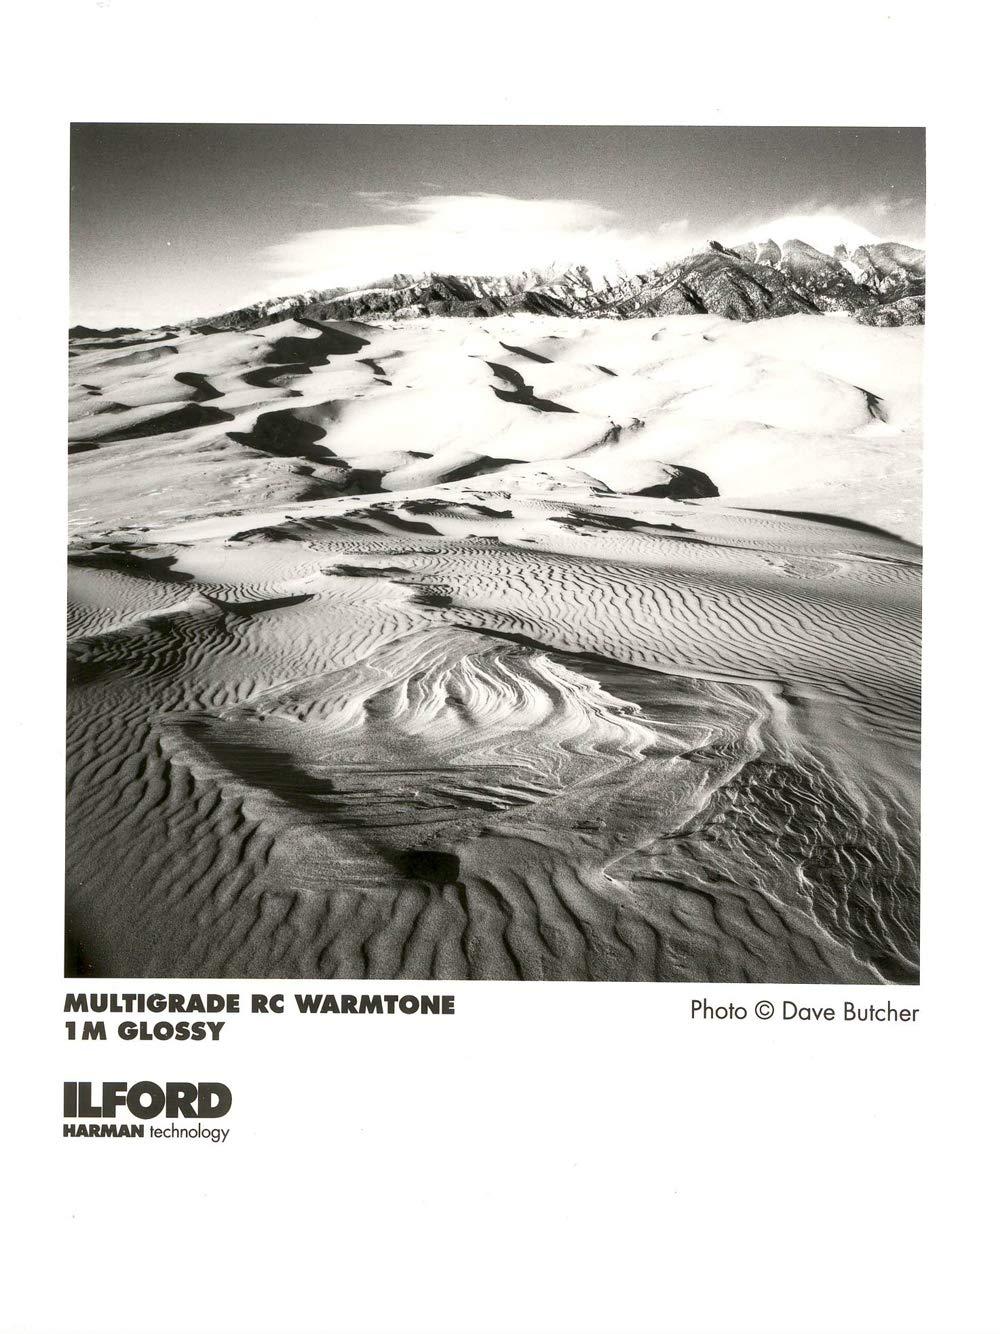 Ilford Multigrade RC Warmtone VC B & W Enlarging Paper - 8x10''-100 Sheets - Glossy Surface by Ilford